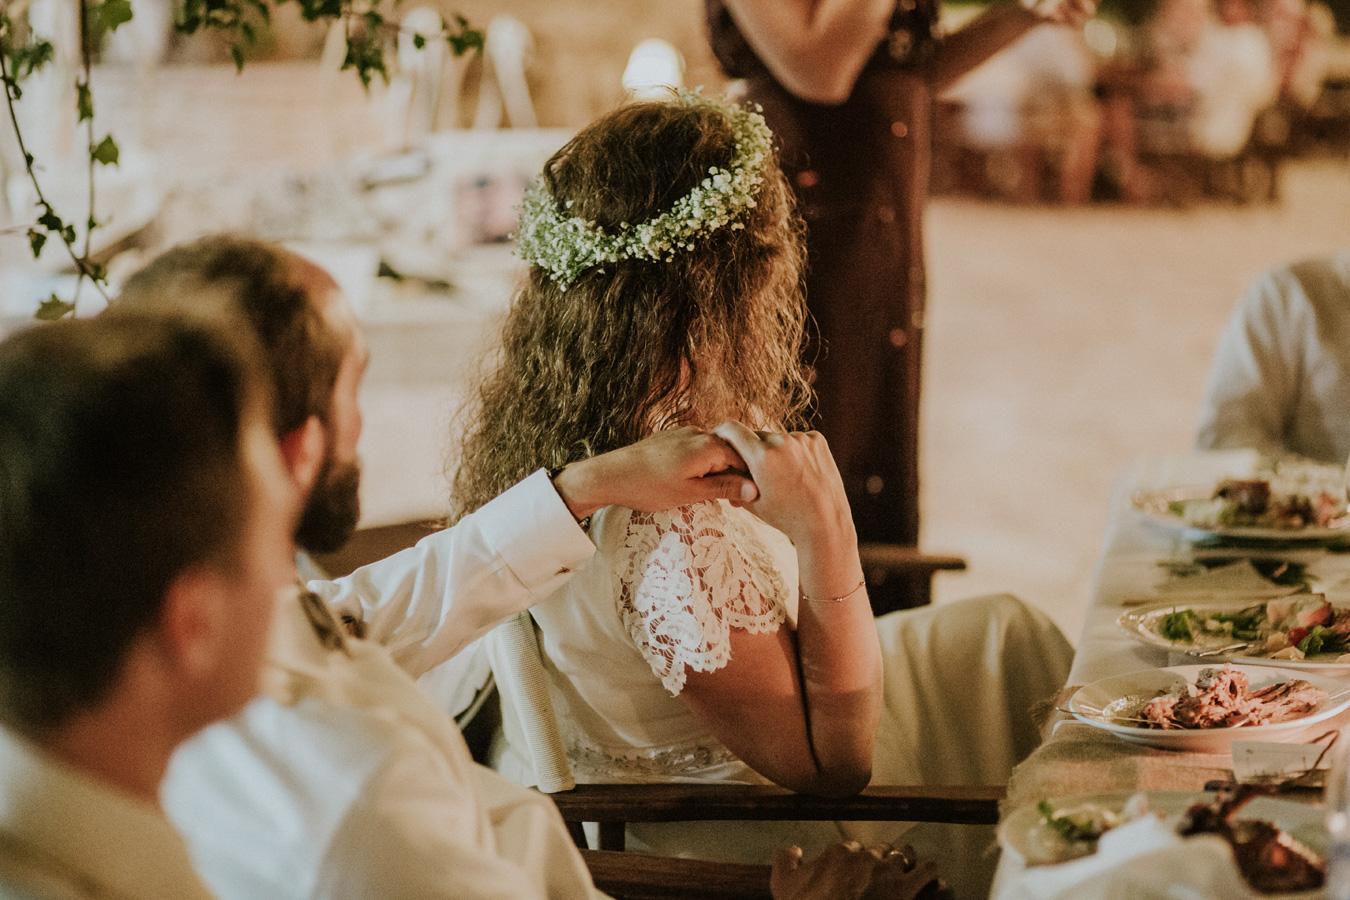 094-bryllupsfotograf-oslo-destinasjonsbryllup-fotograf-tone-tvedt.jpg